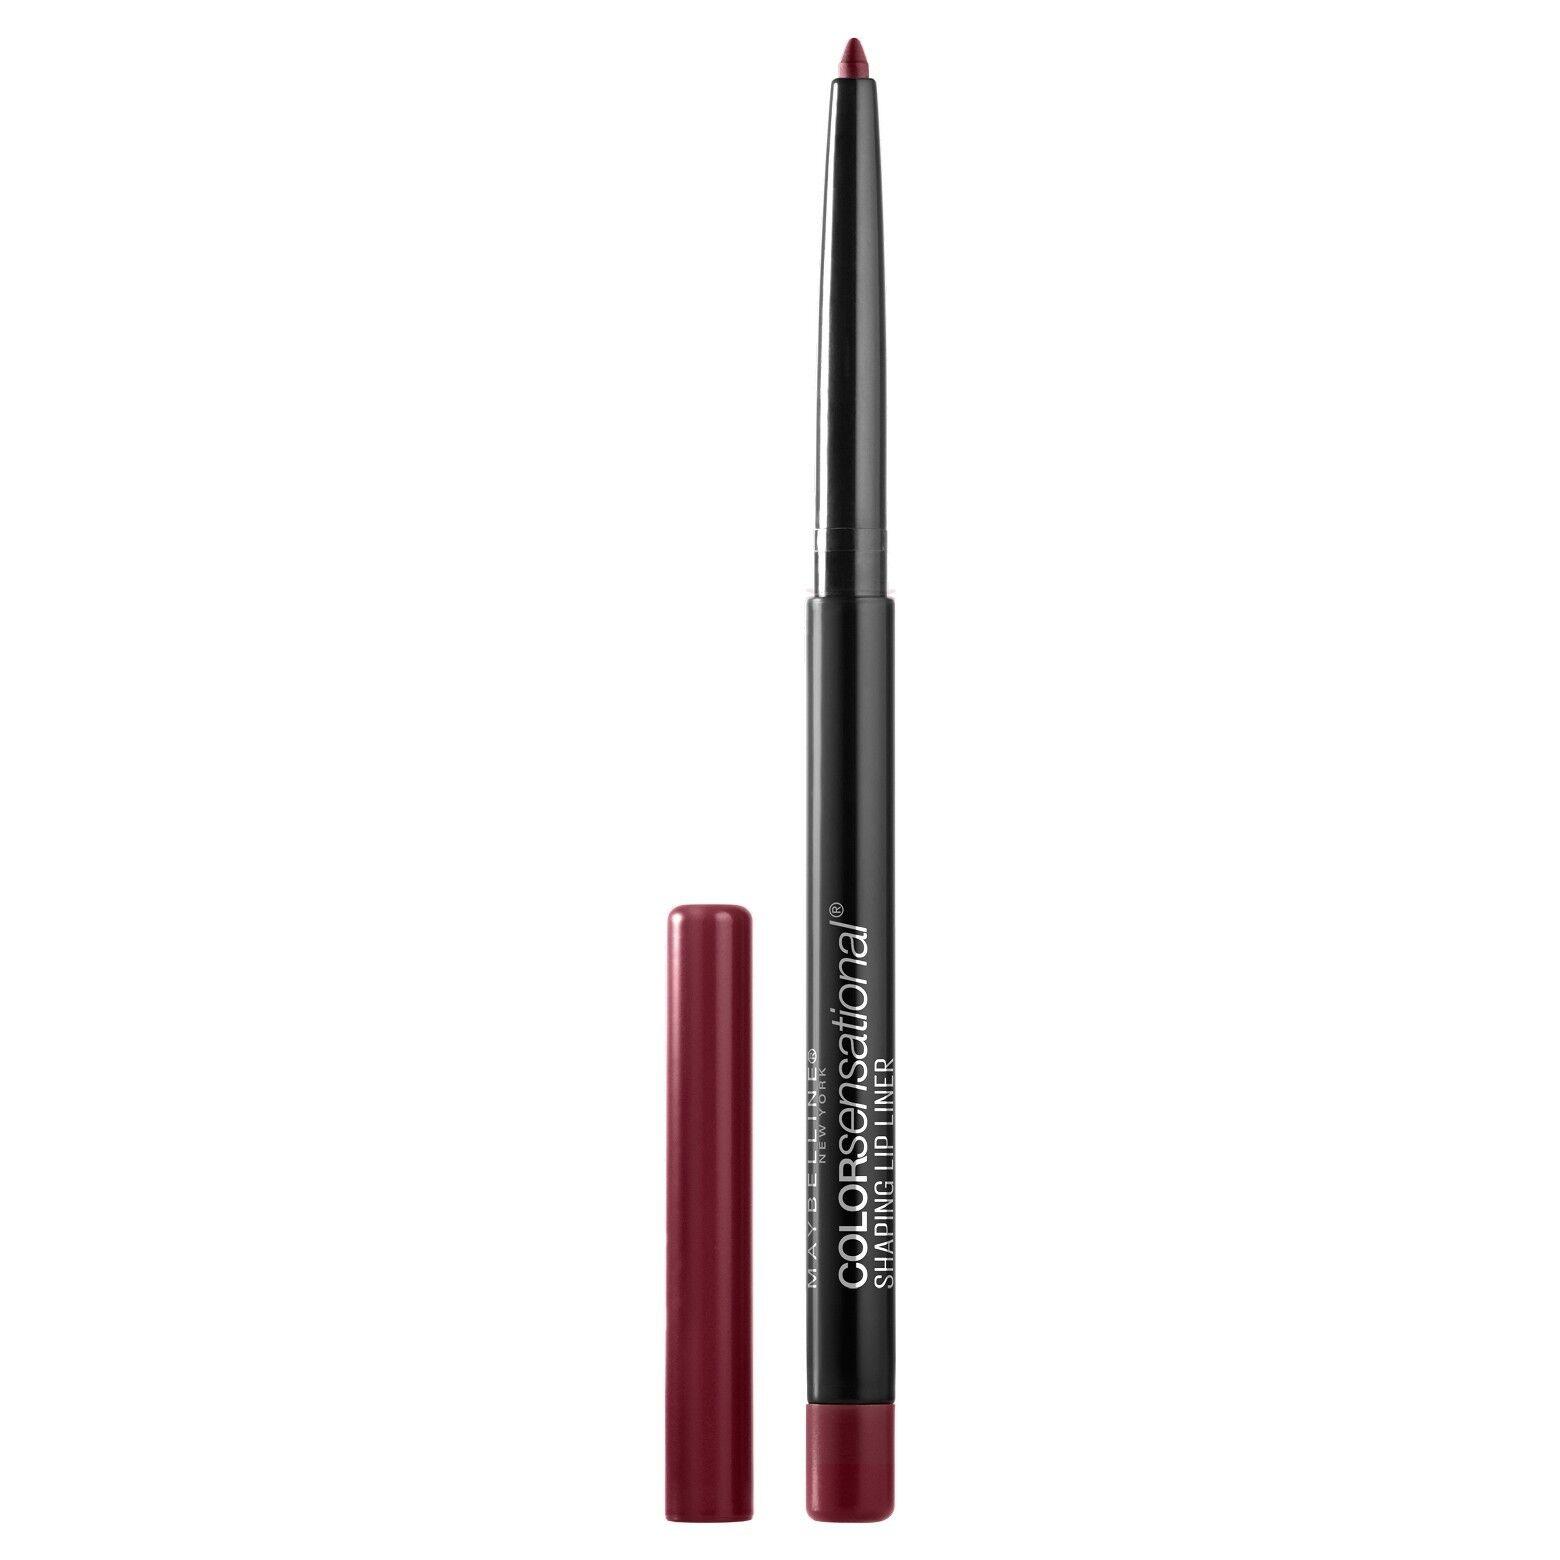 Maybelline Color Sensational Shaping Lip Liner Creamy Pencil